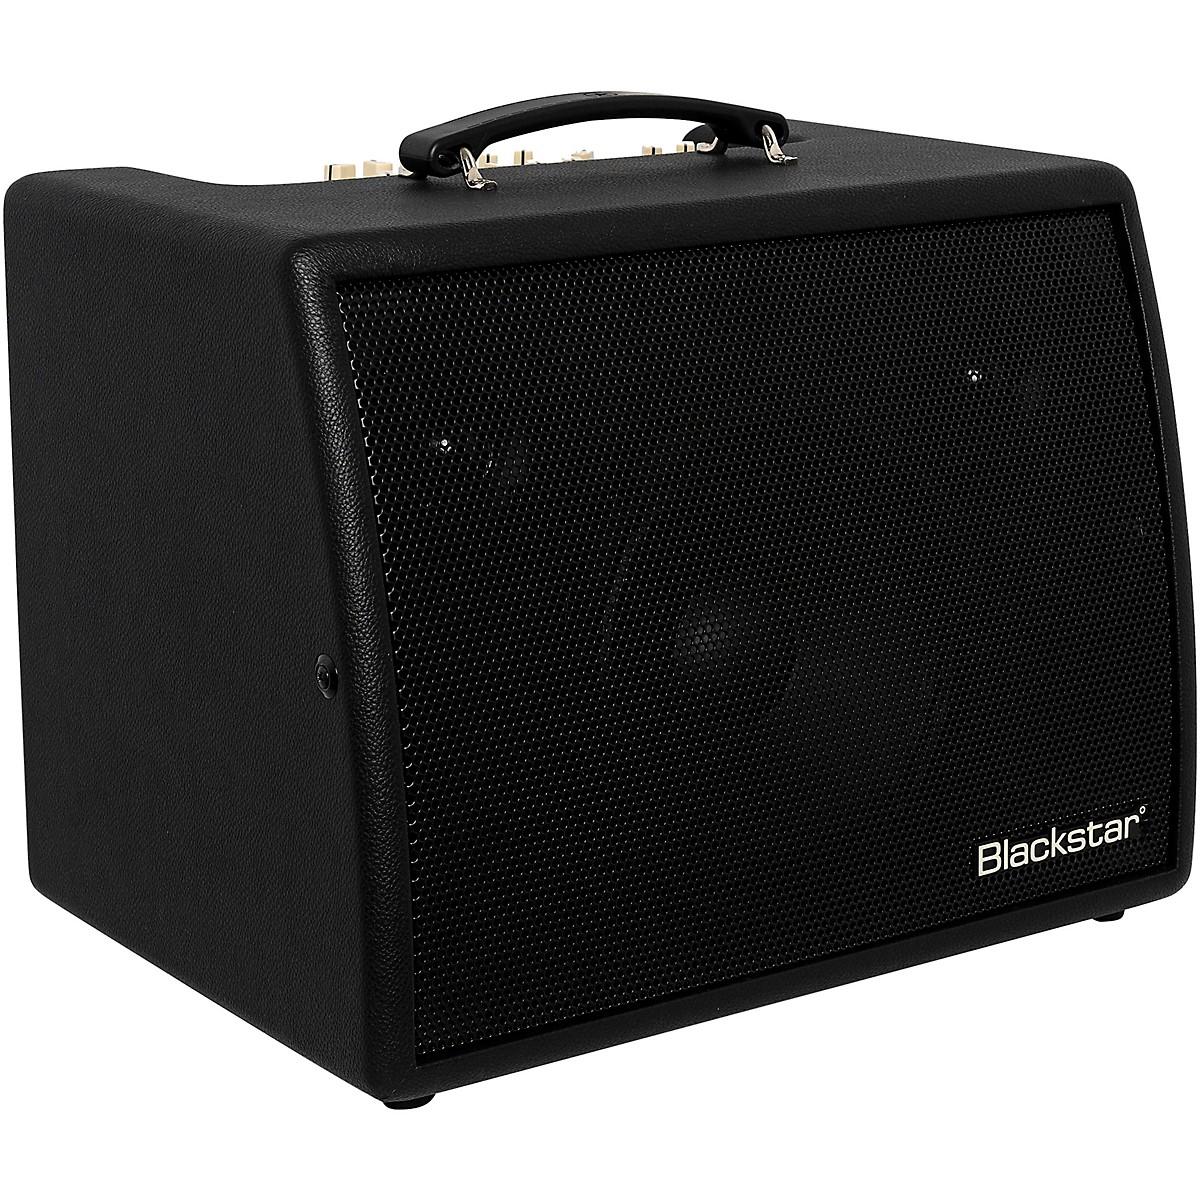 Blackstar Sonnet 120 120W 1x8 Acoustic Combo Amplifier